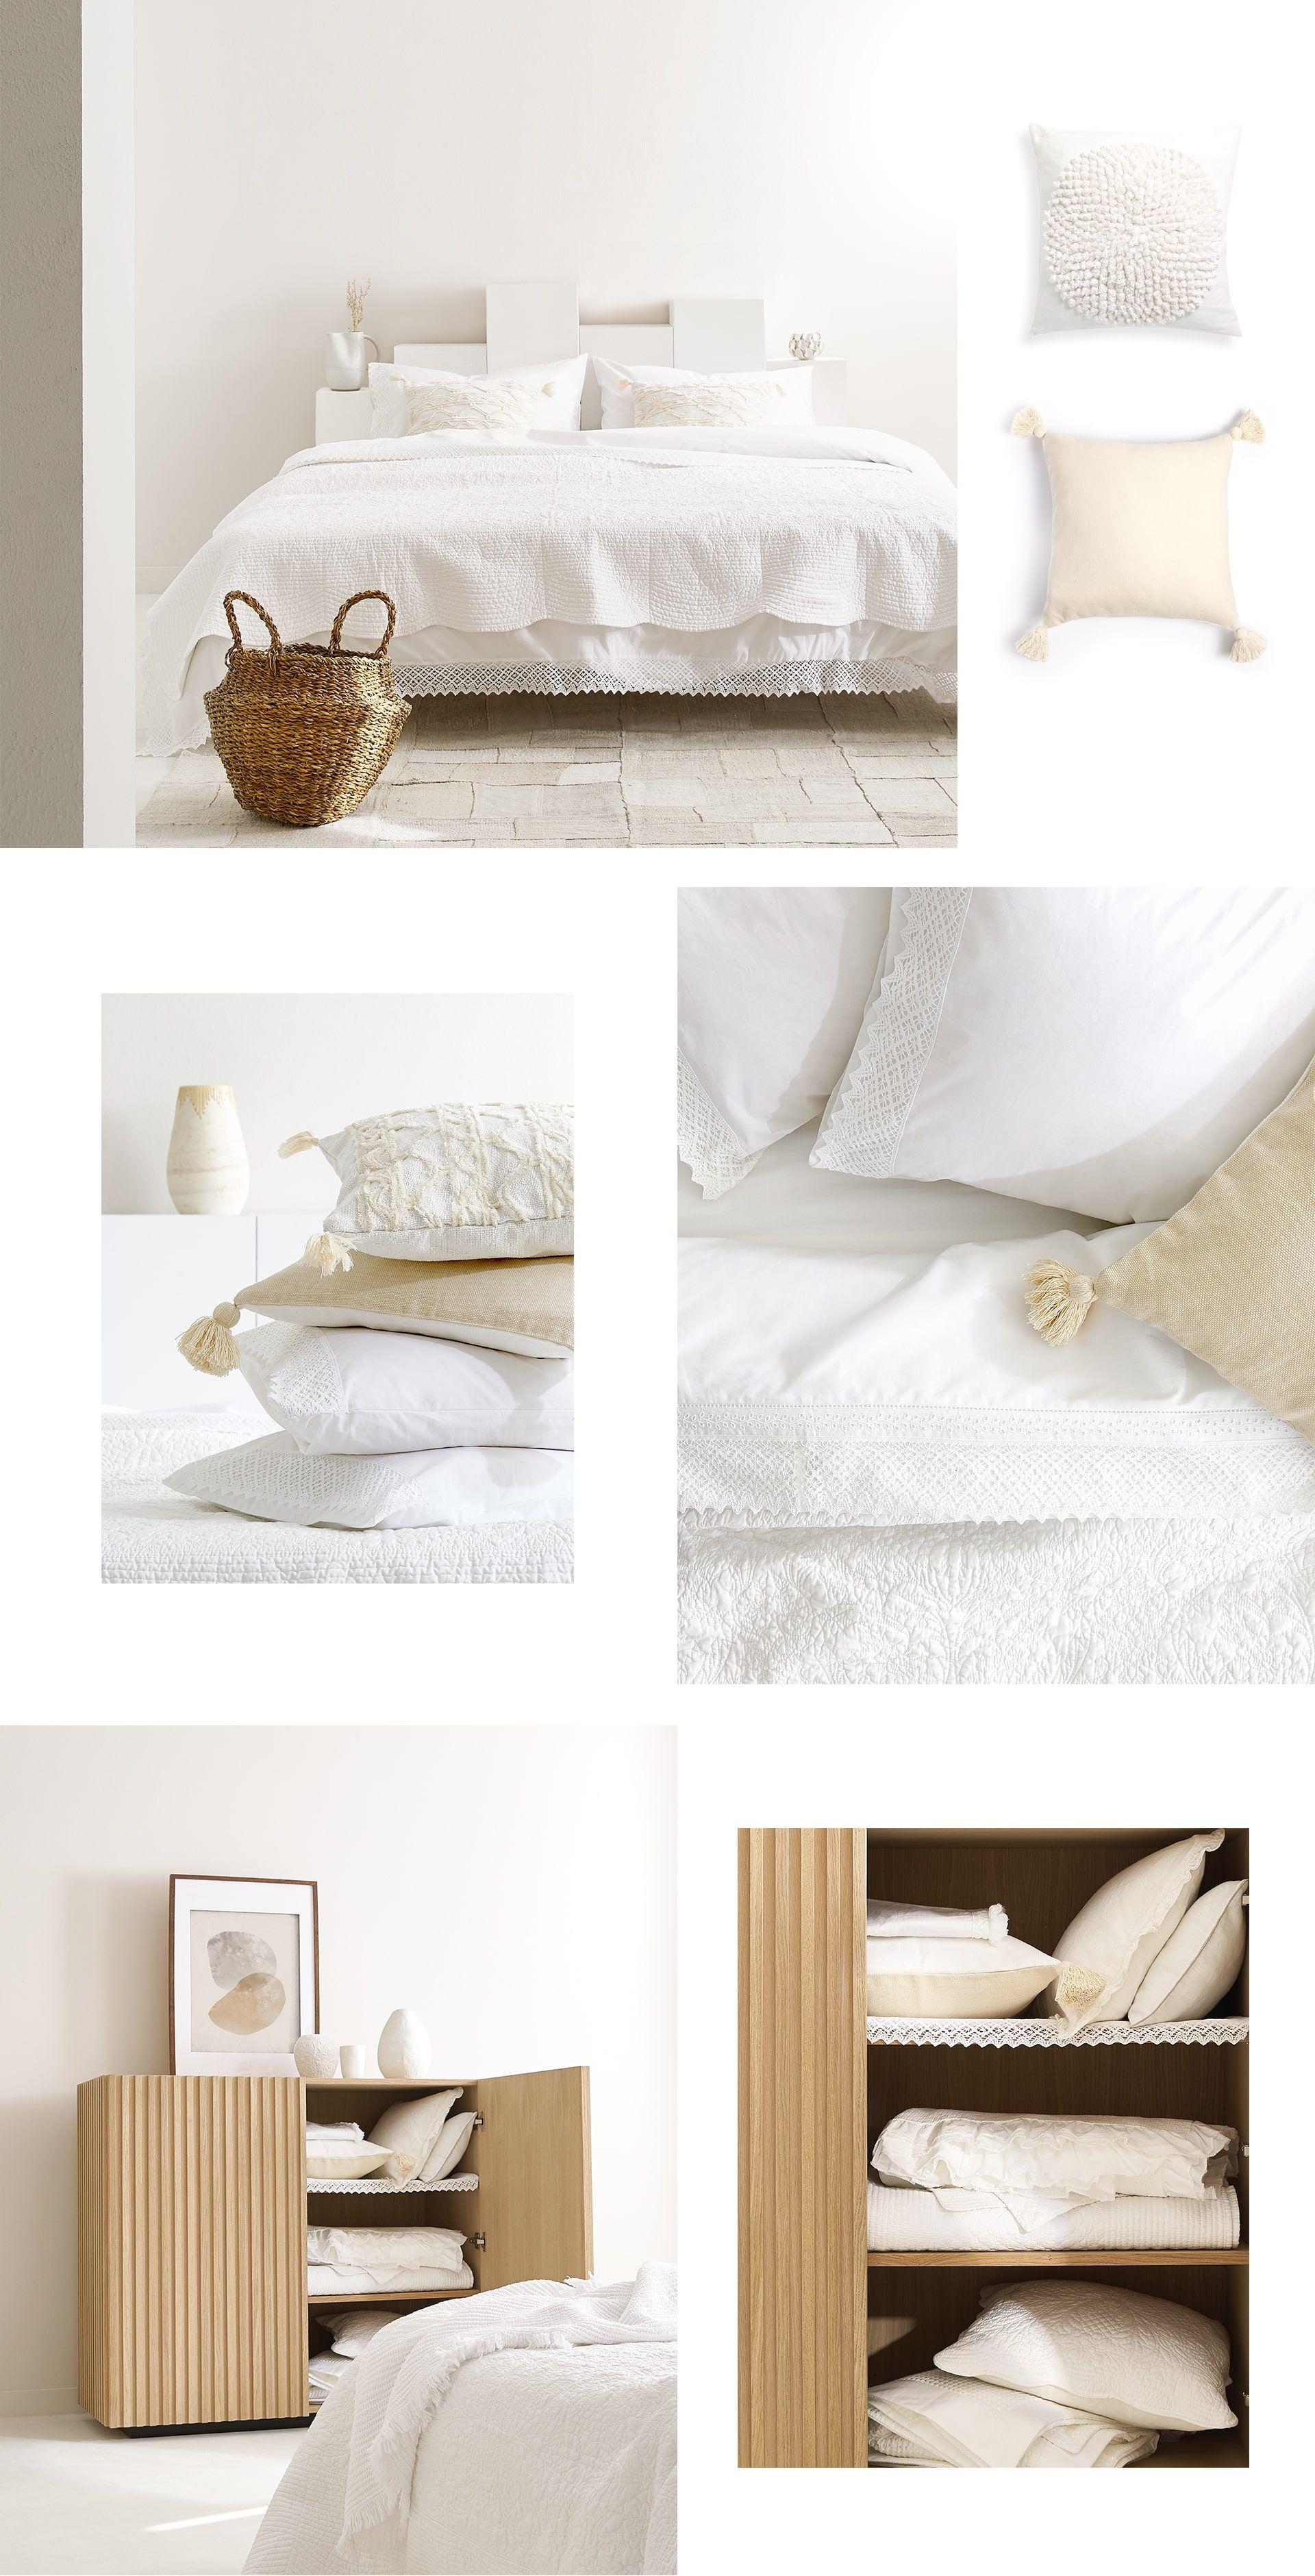 White Bedding Dormitorio Zara Home Espana White Bedding